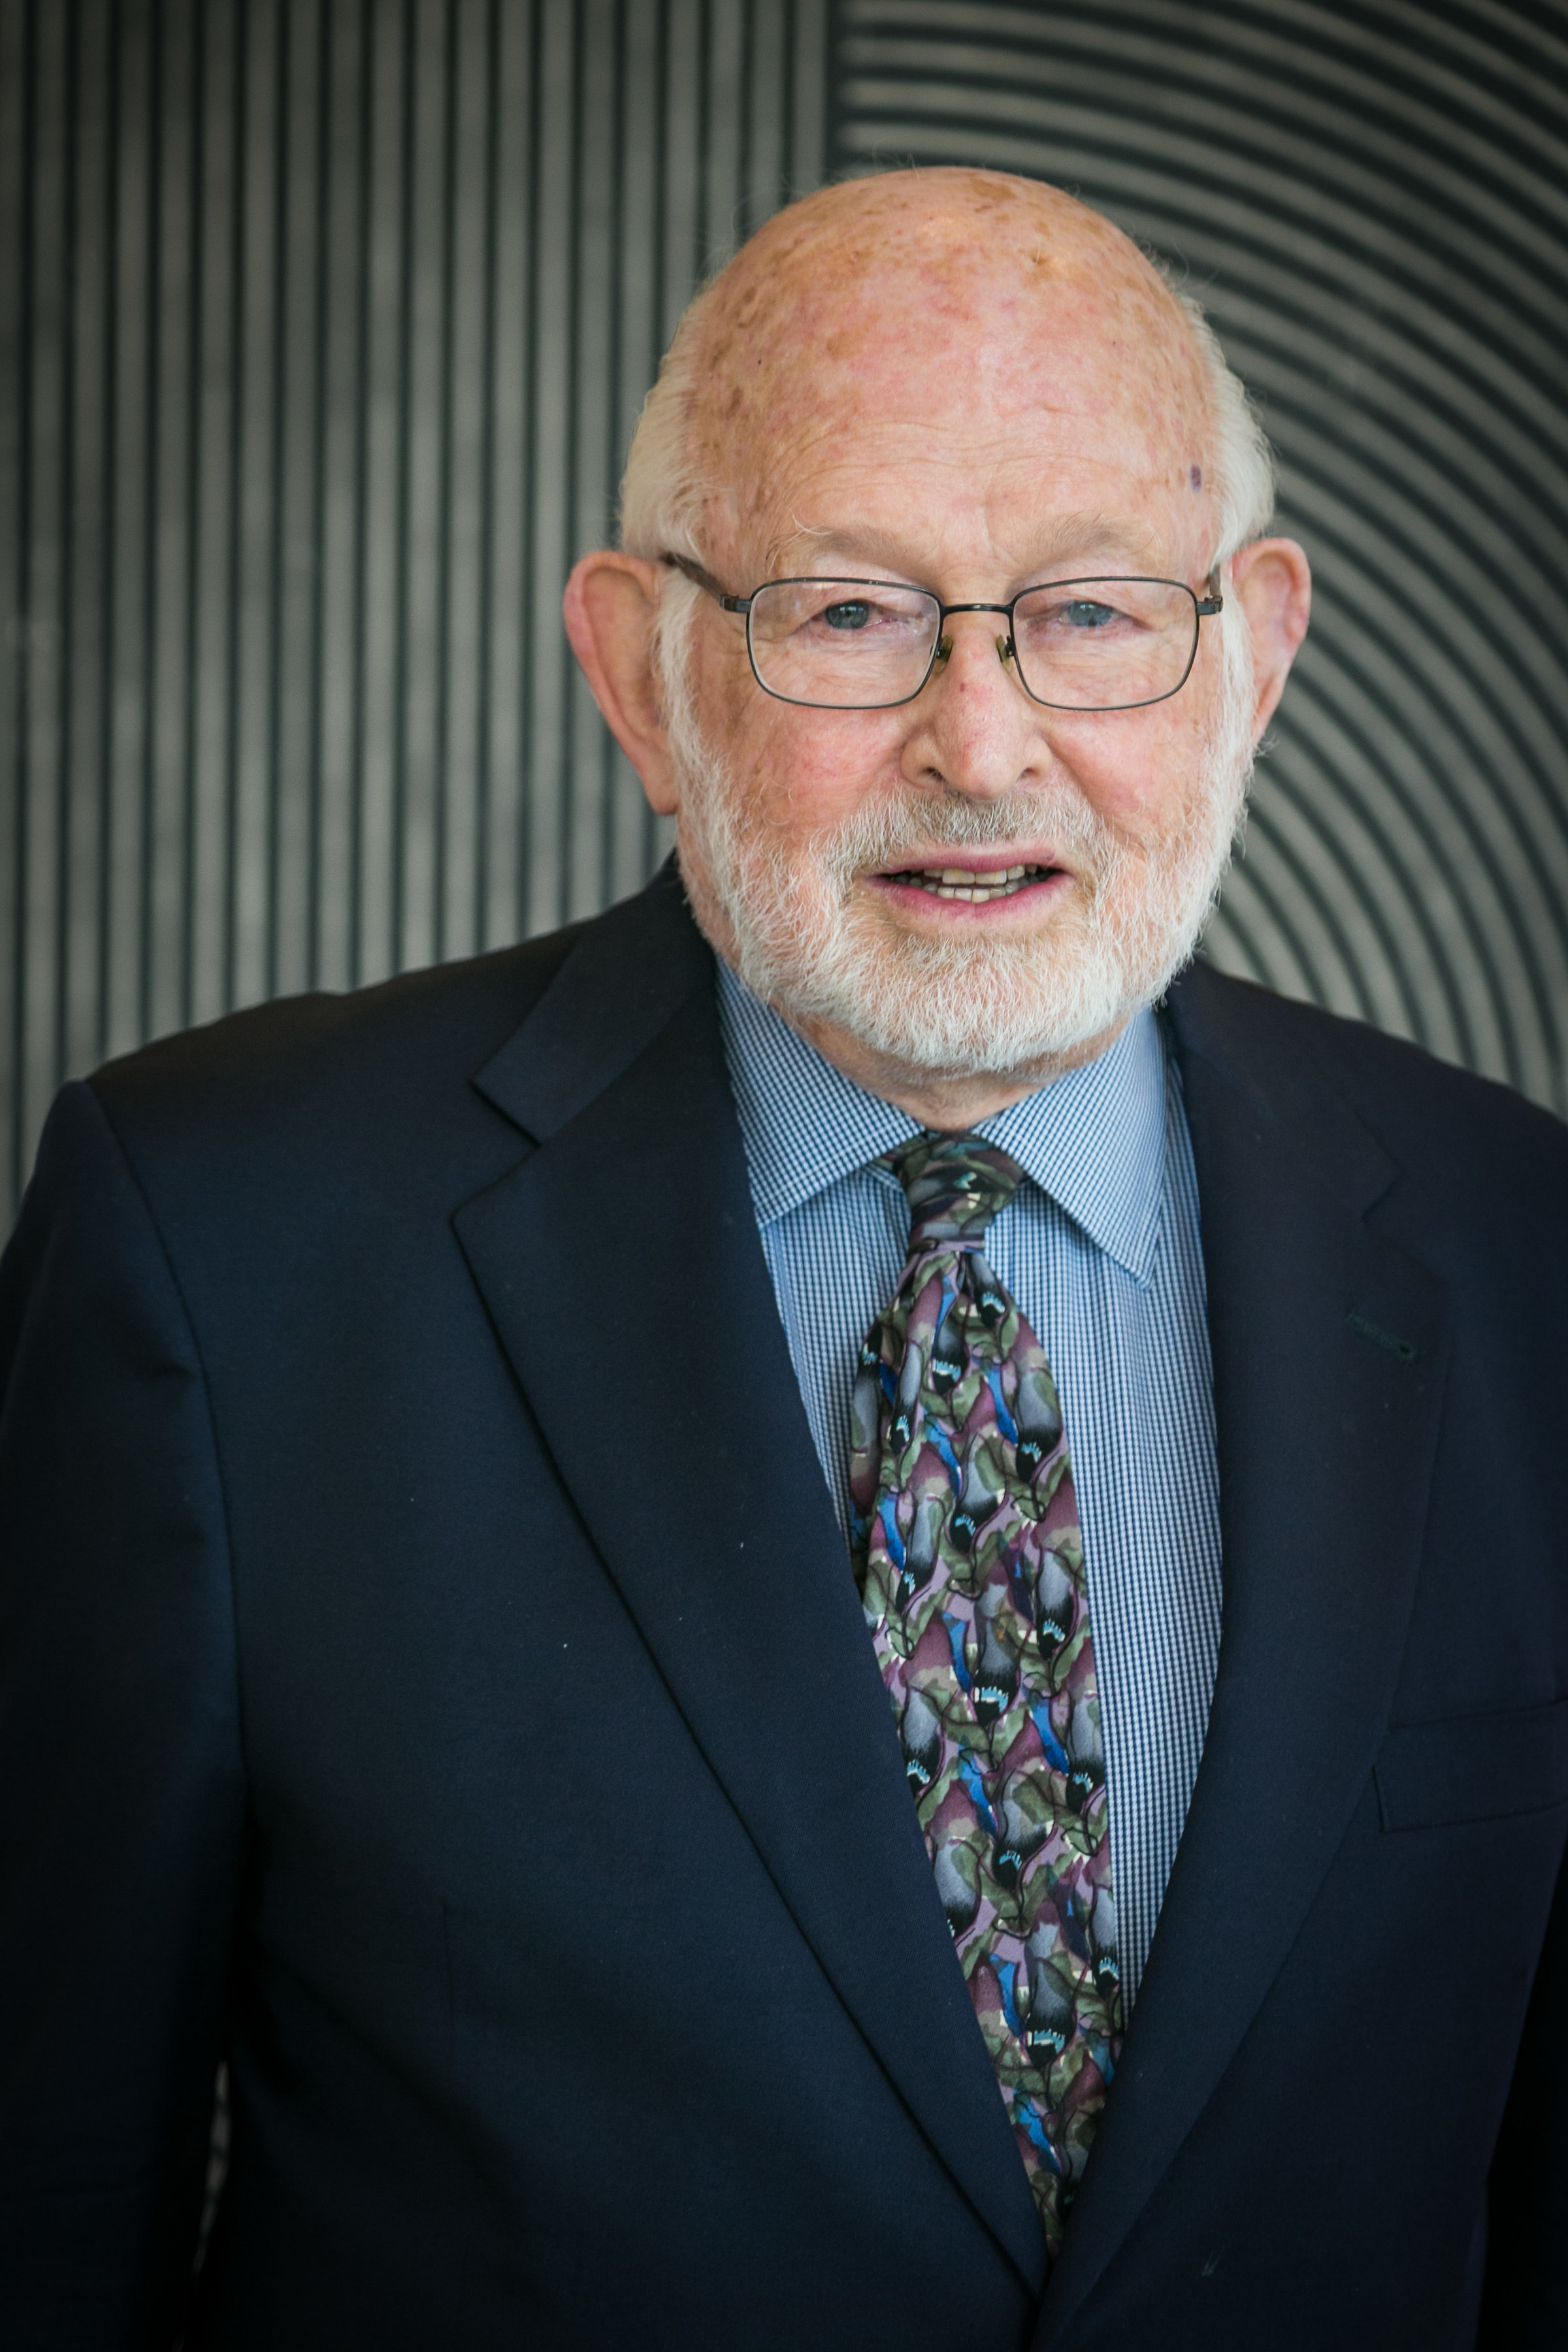 Donald J. Stone